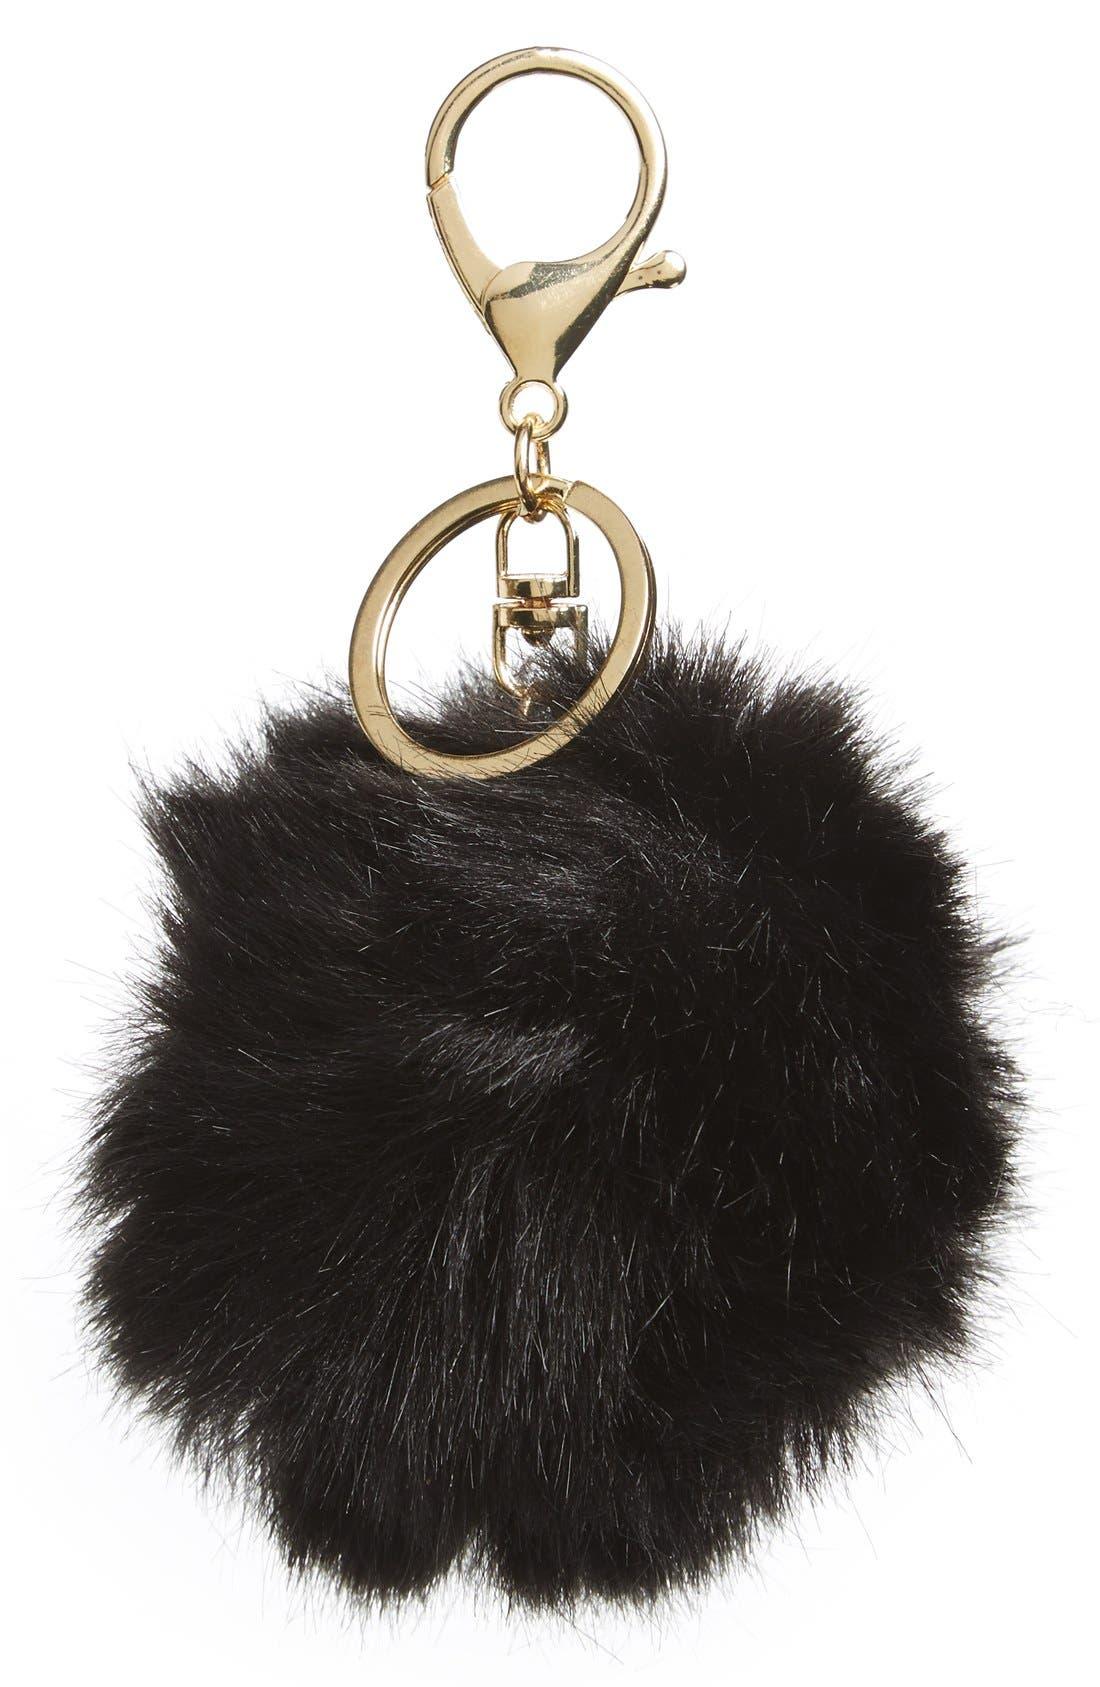 Main Image - BP. Faux Fur Pom Bag Charm